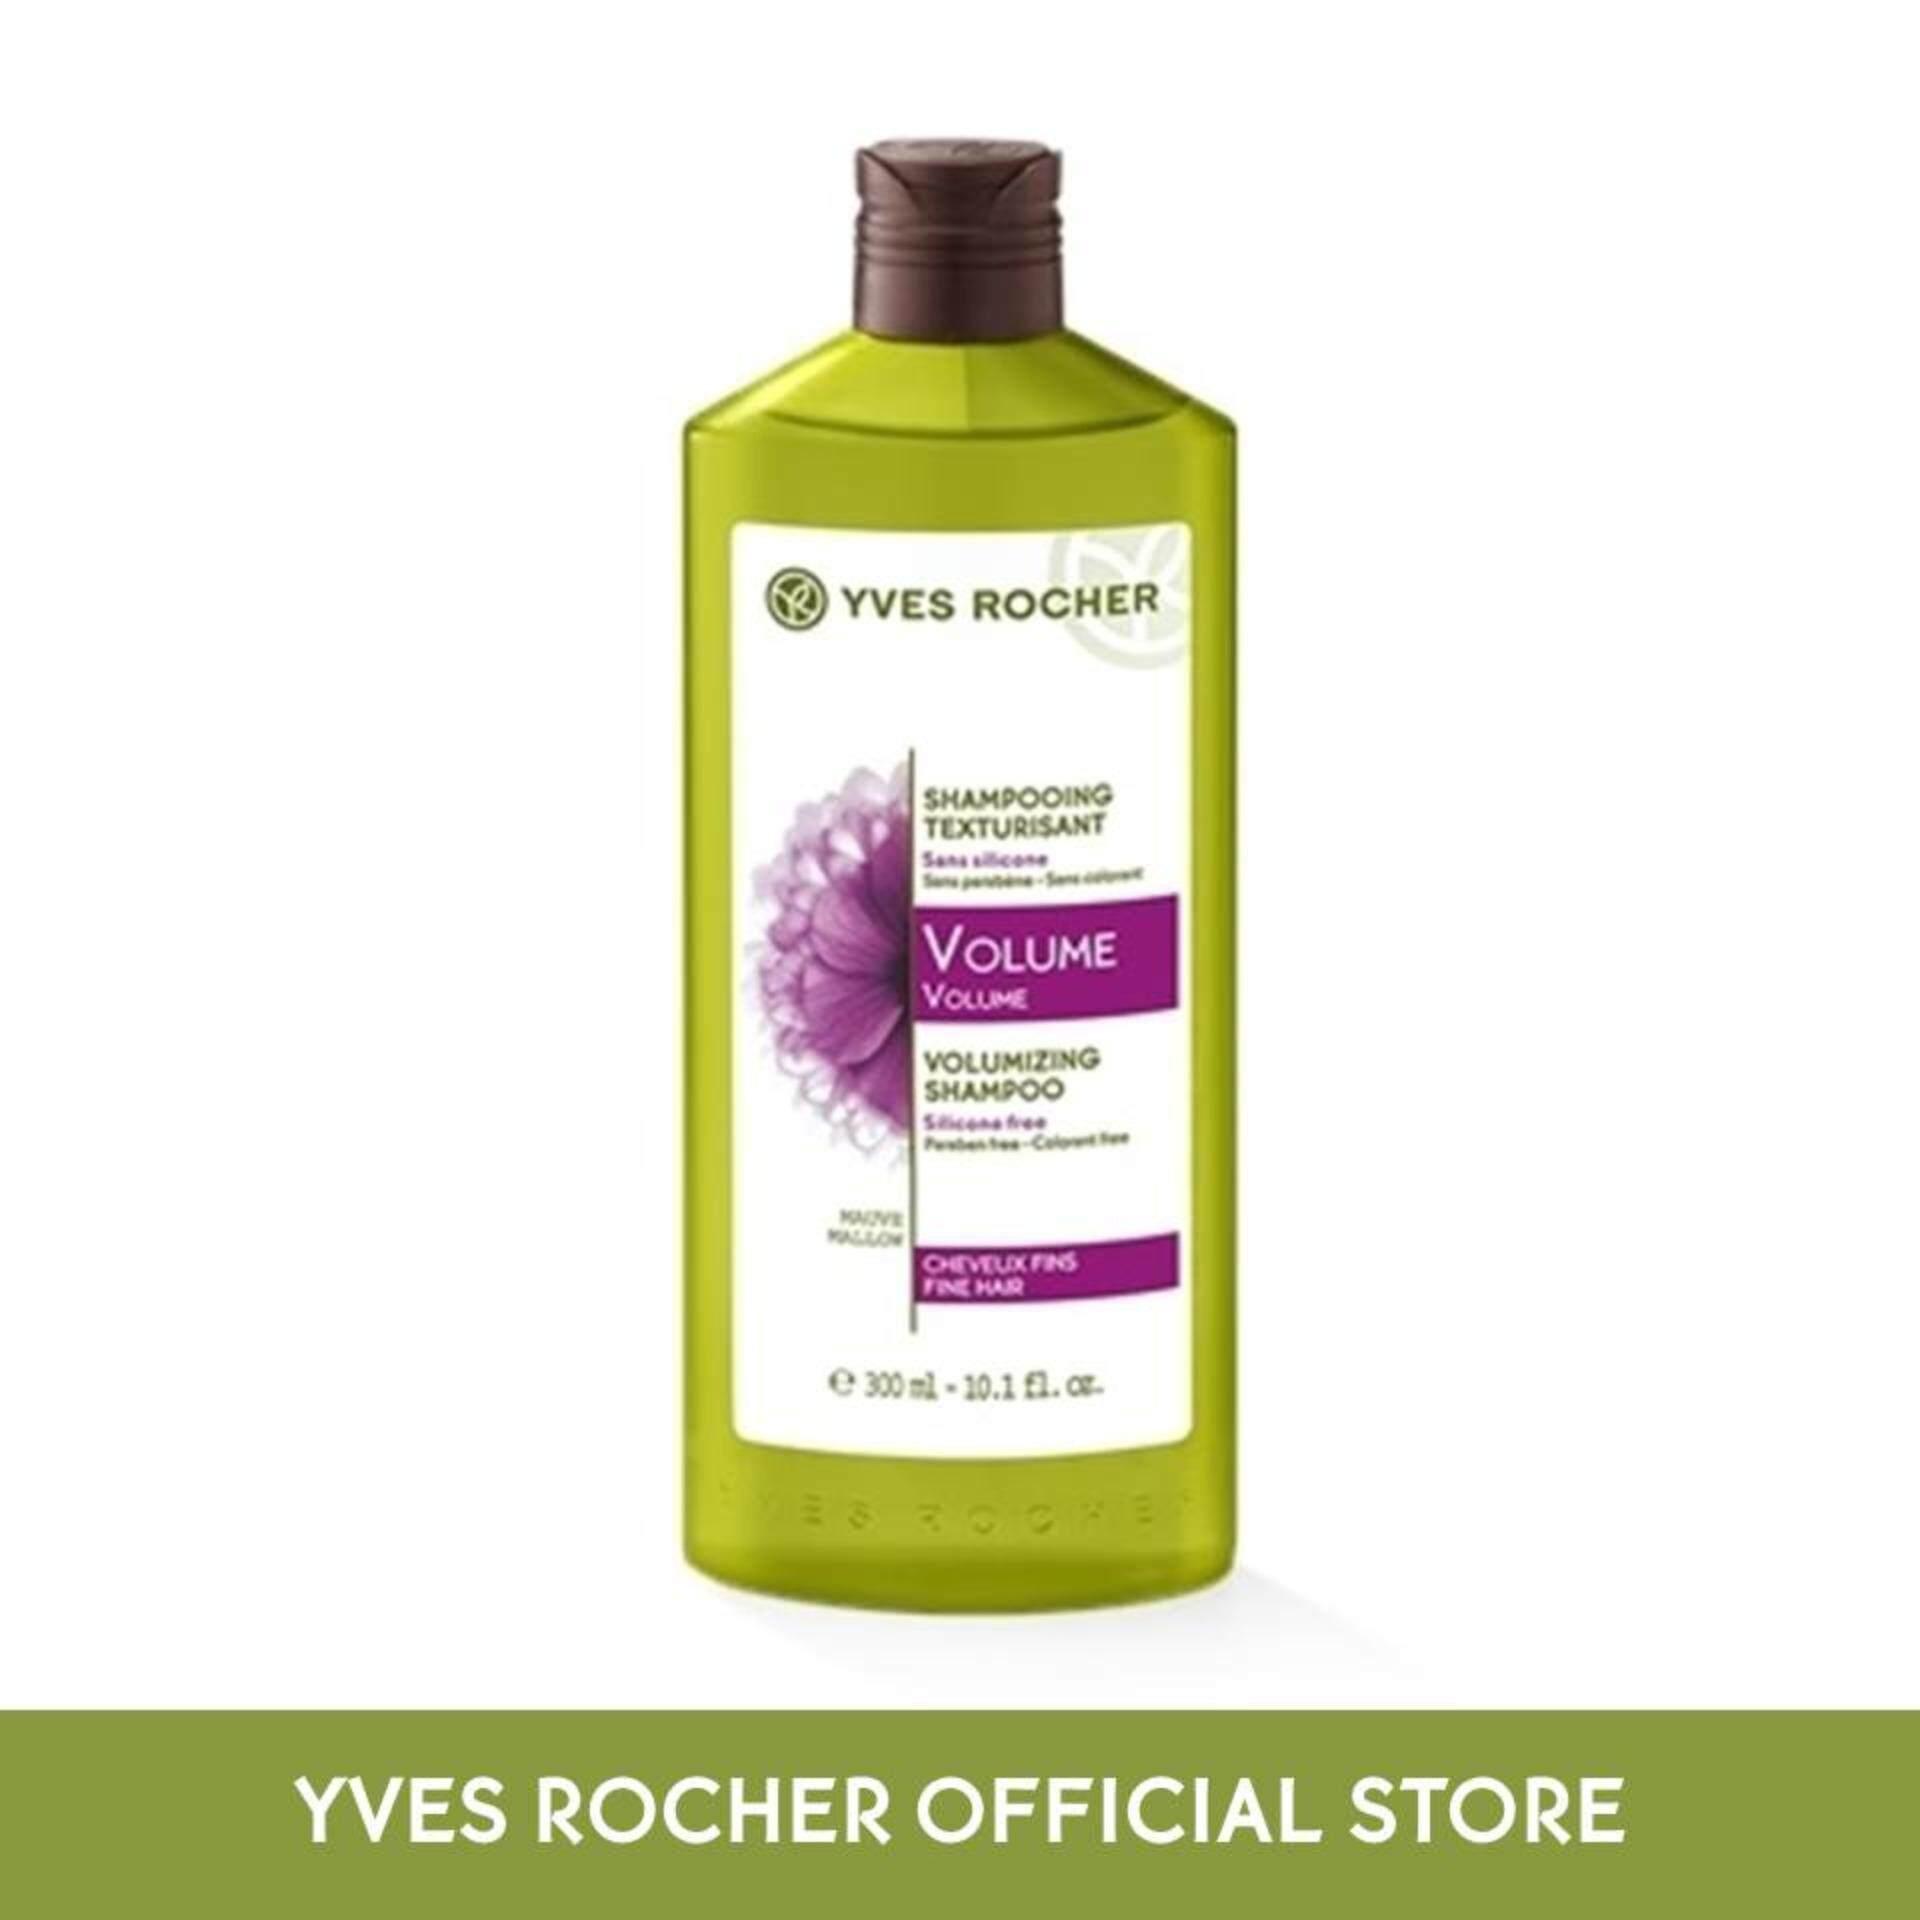 Yves Rocher Shampoo Volumizing Jar 300ml